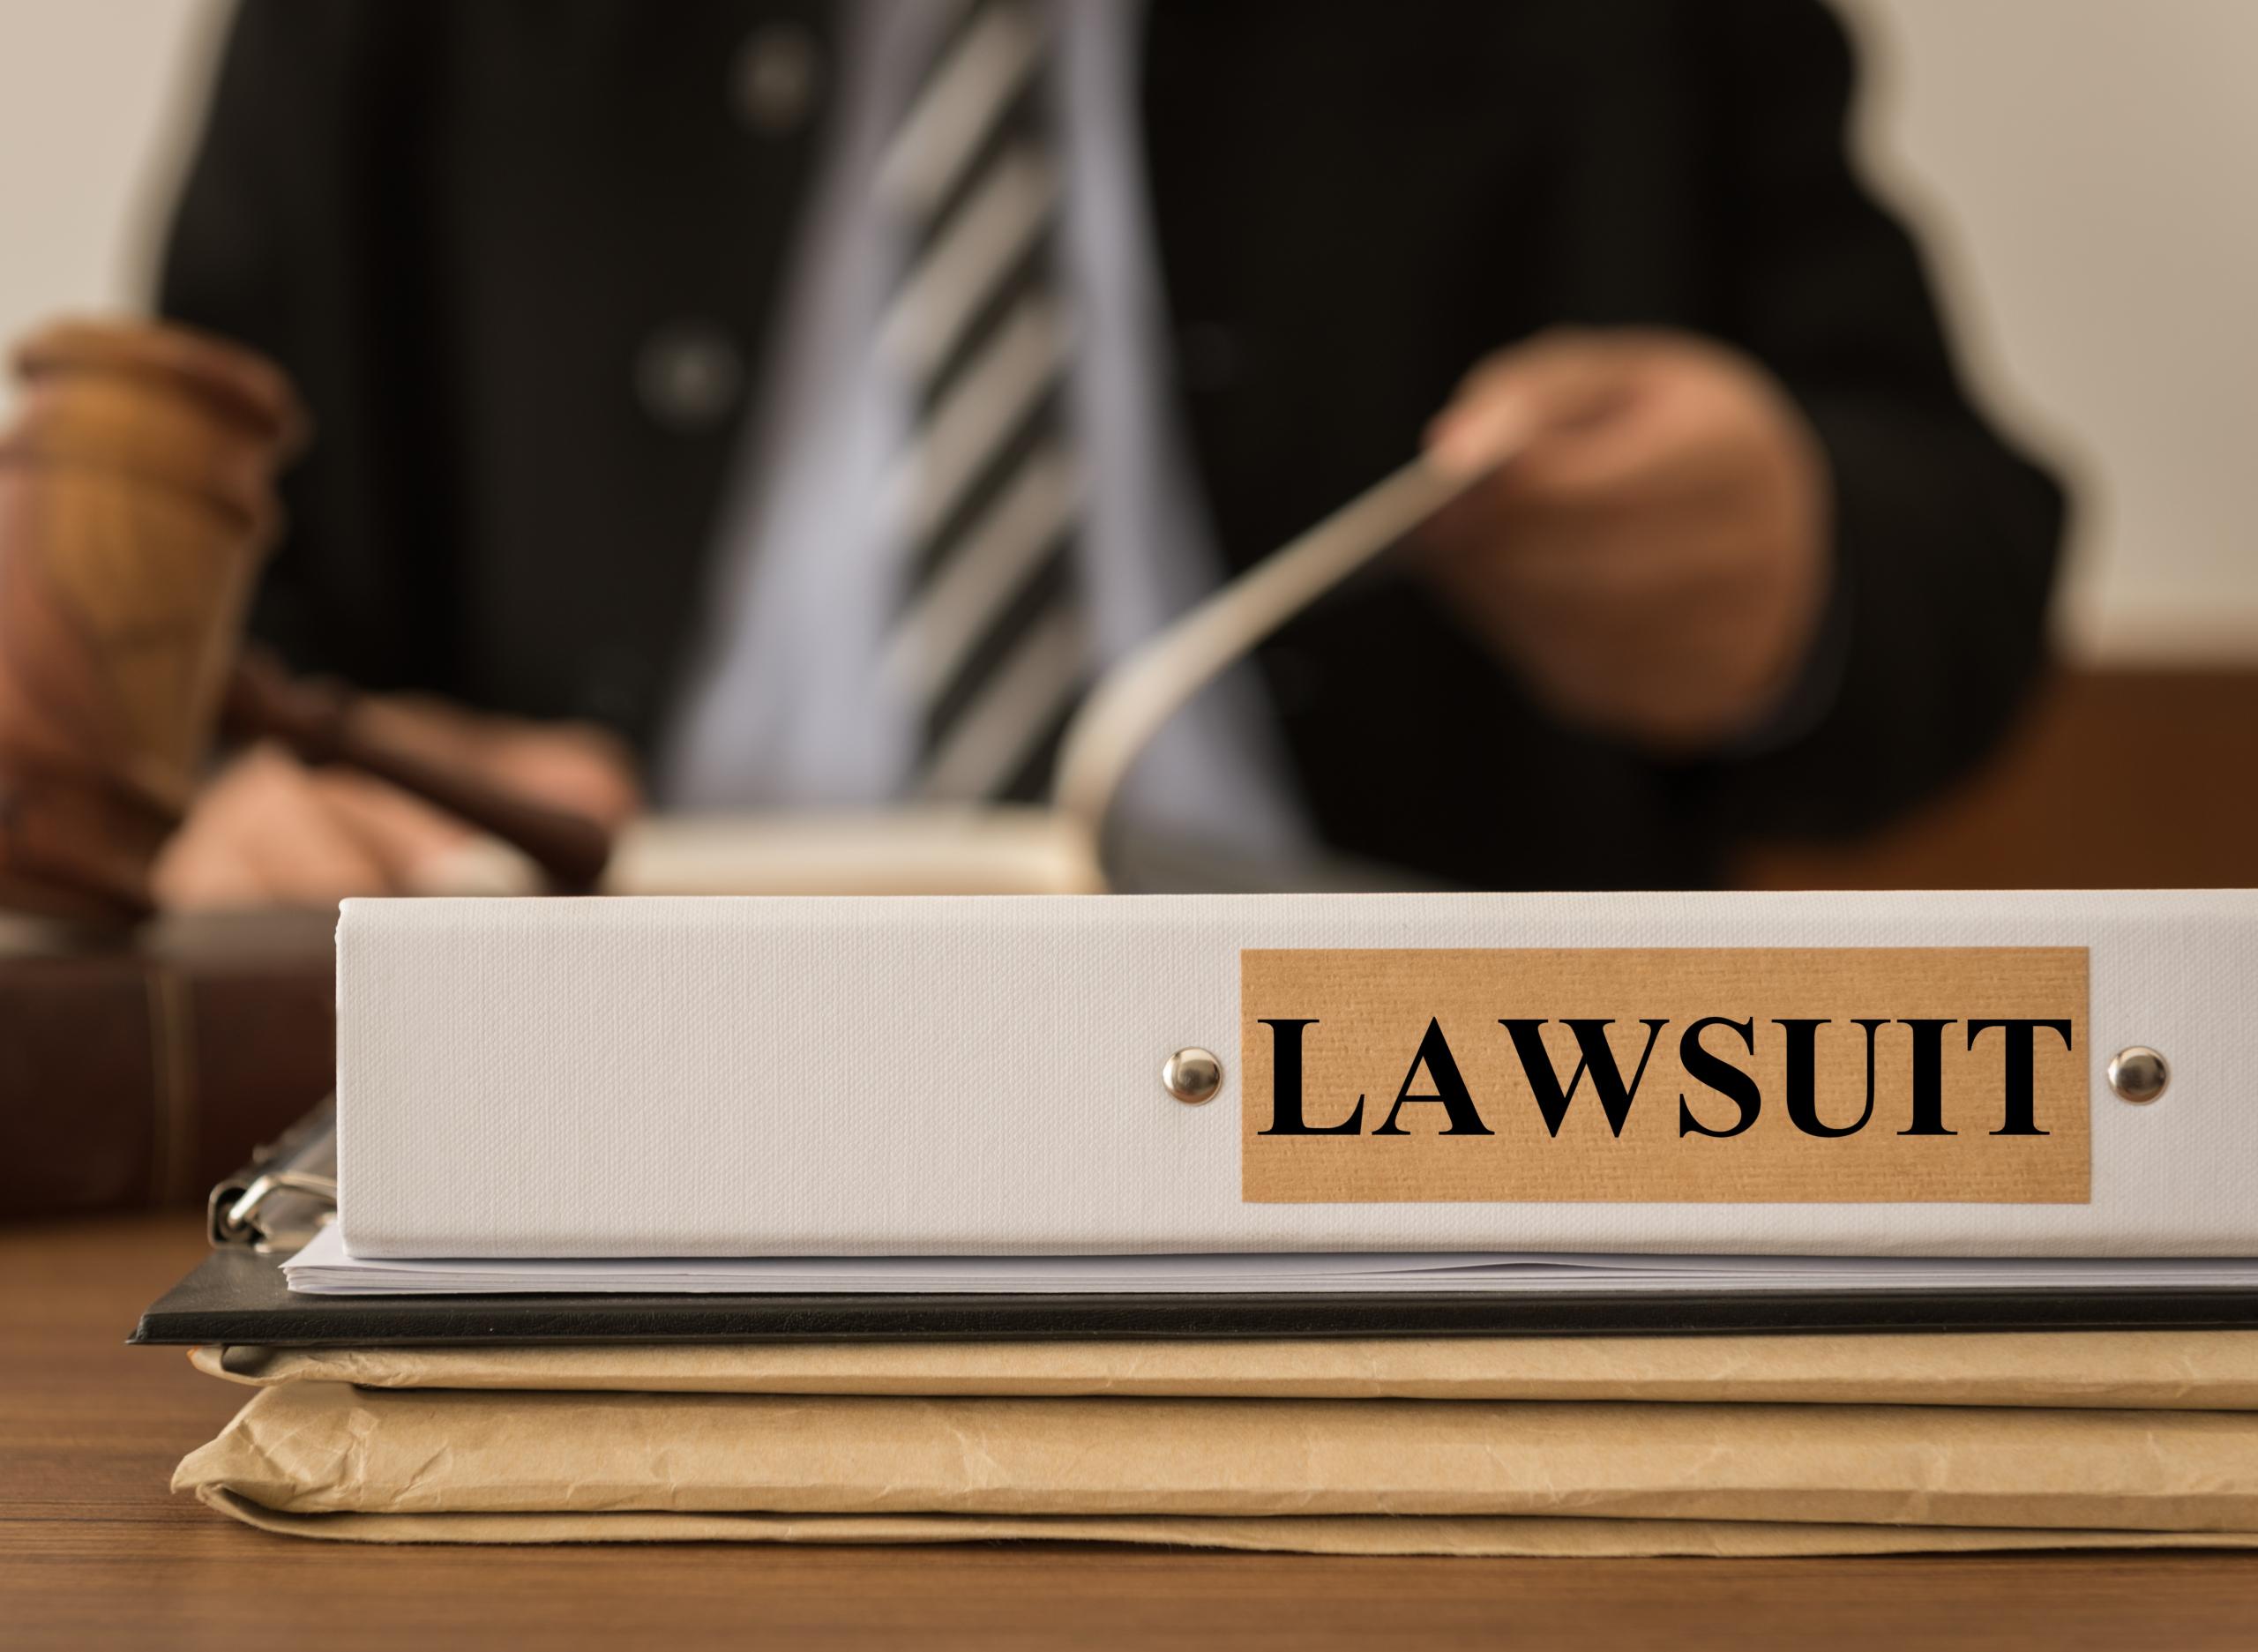 Filing Lawsuit